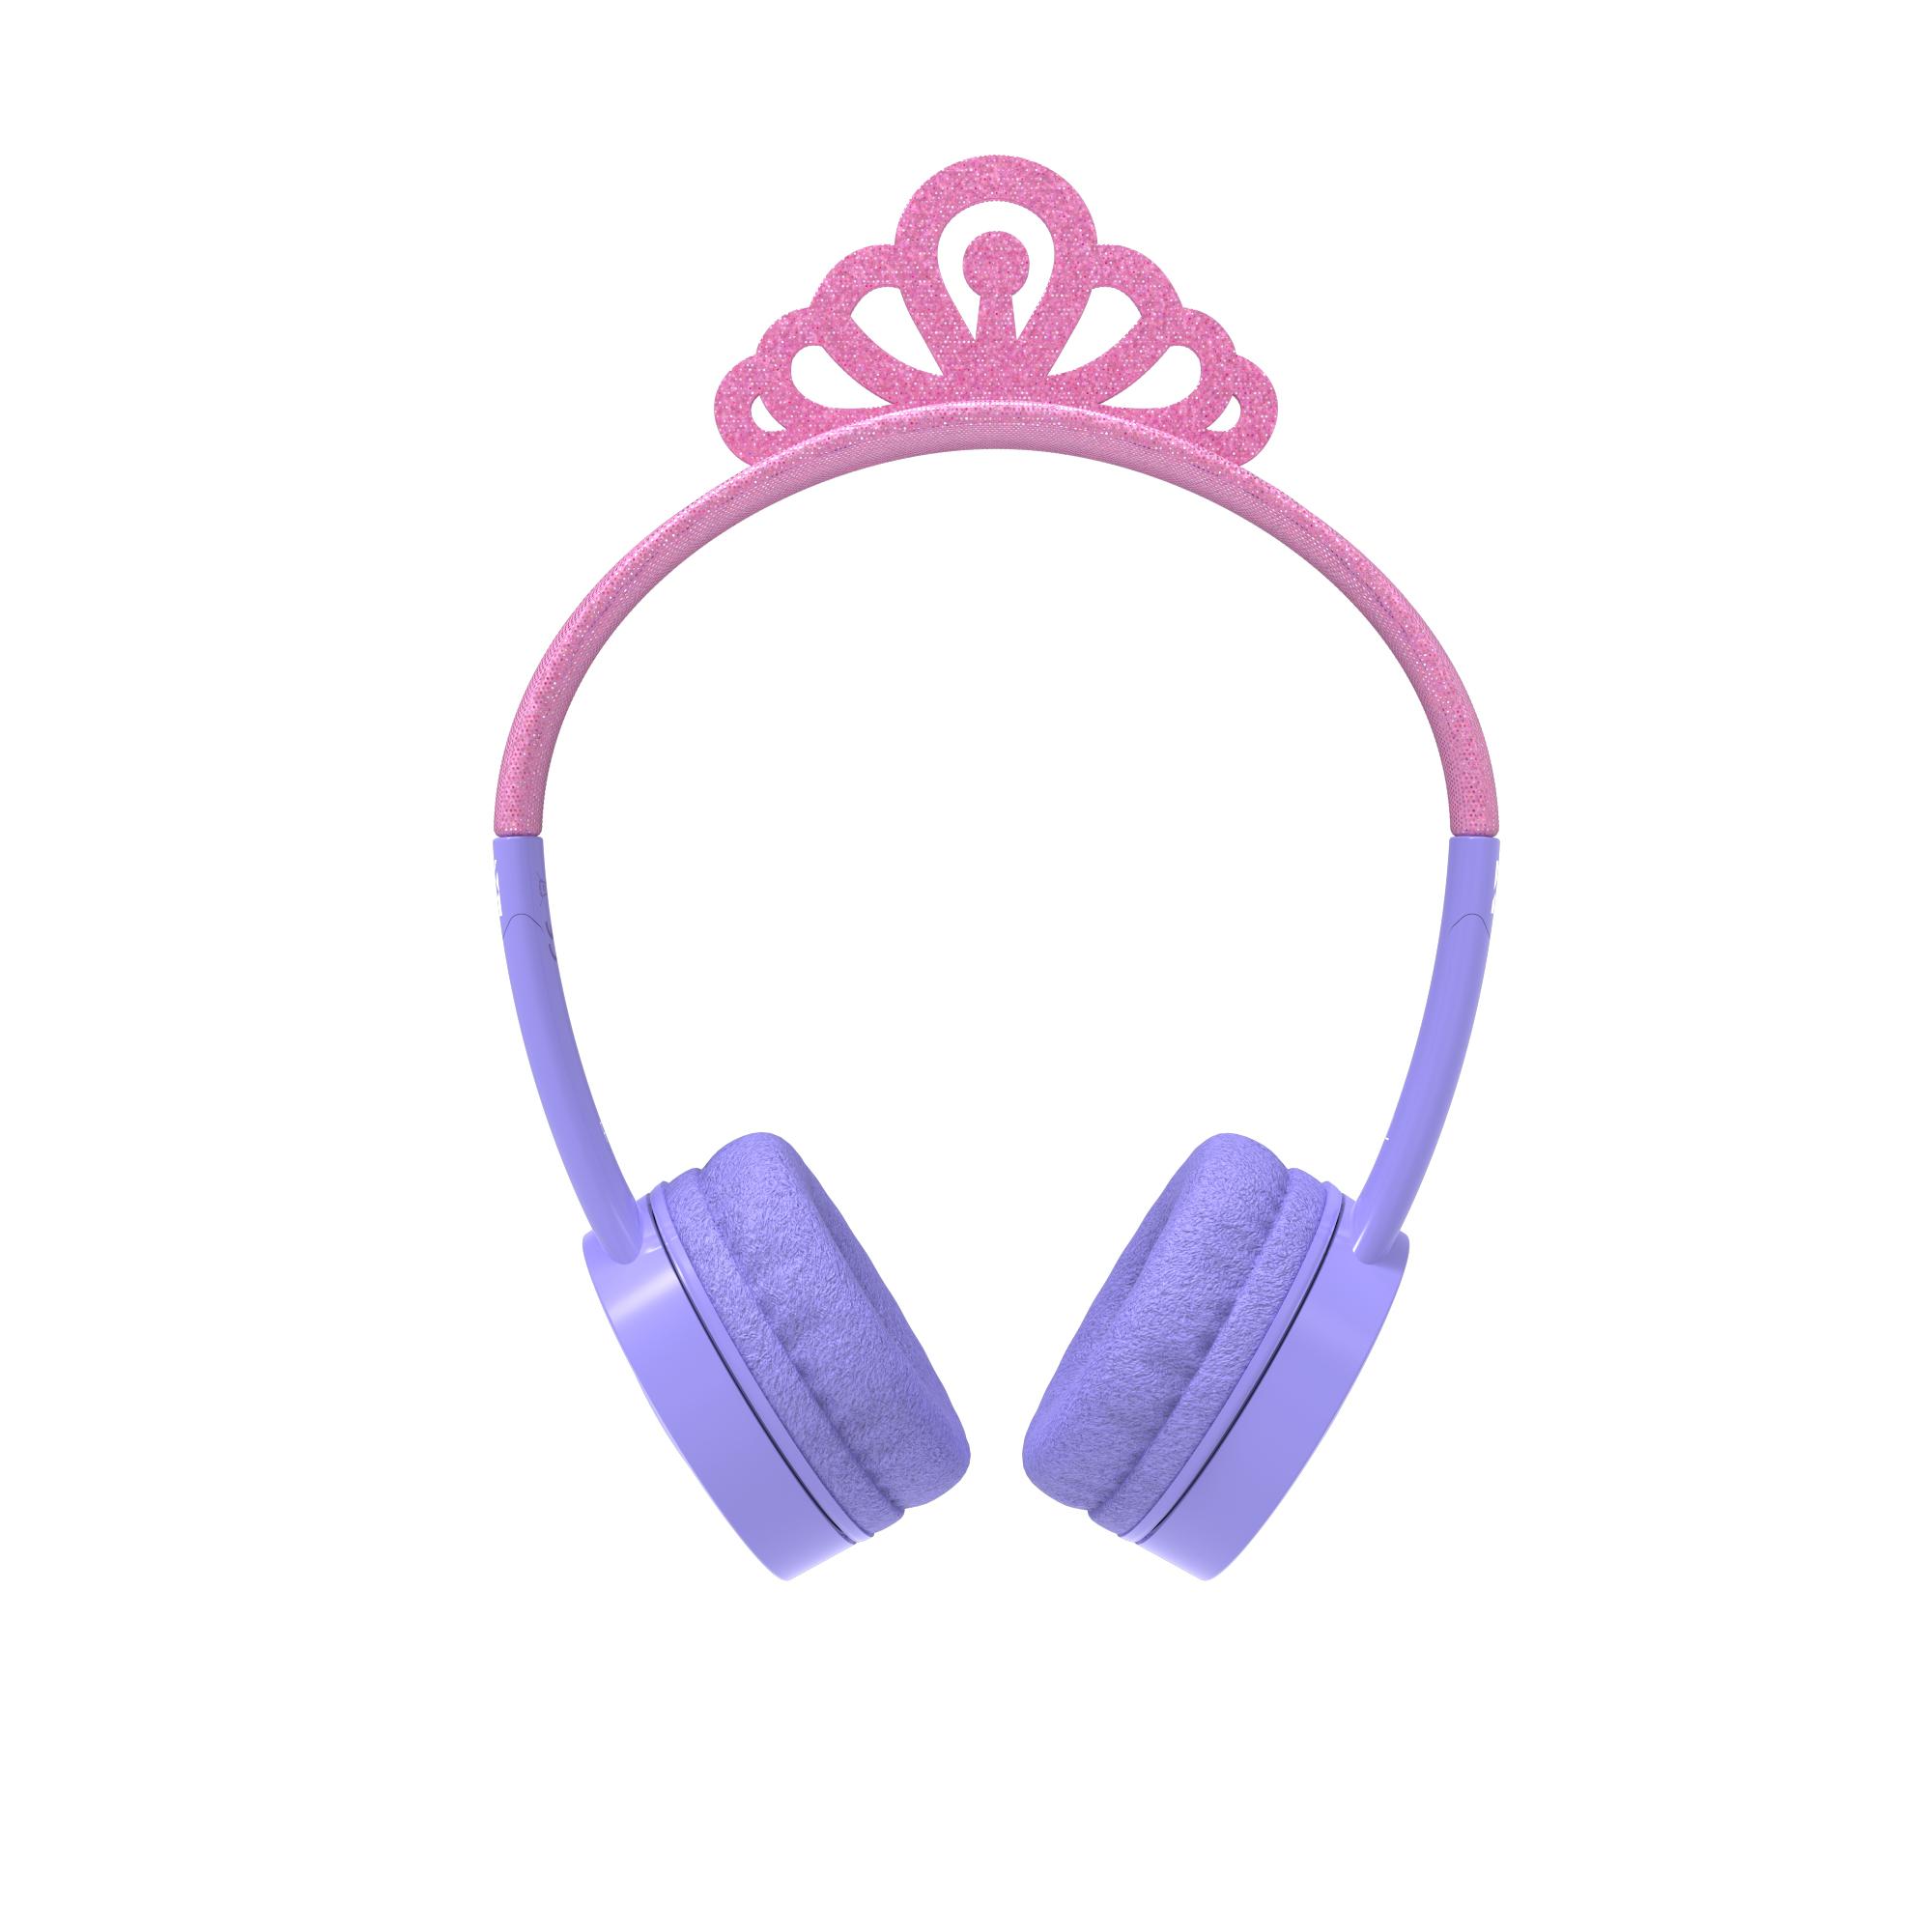 IFROGZ Little Rockerz Costume Headphones Head-band Pink